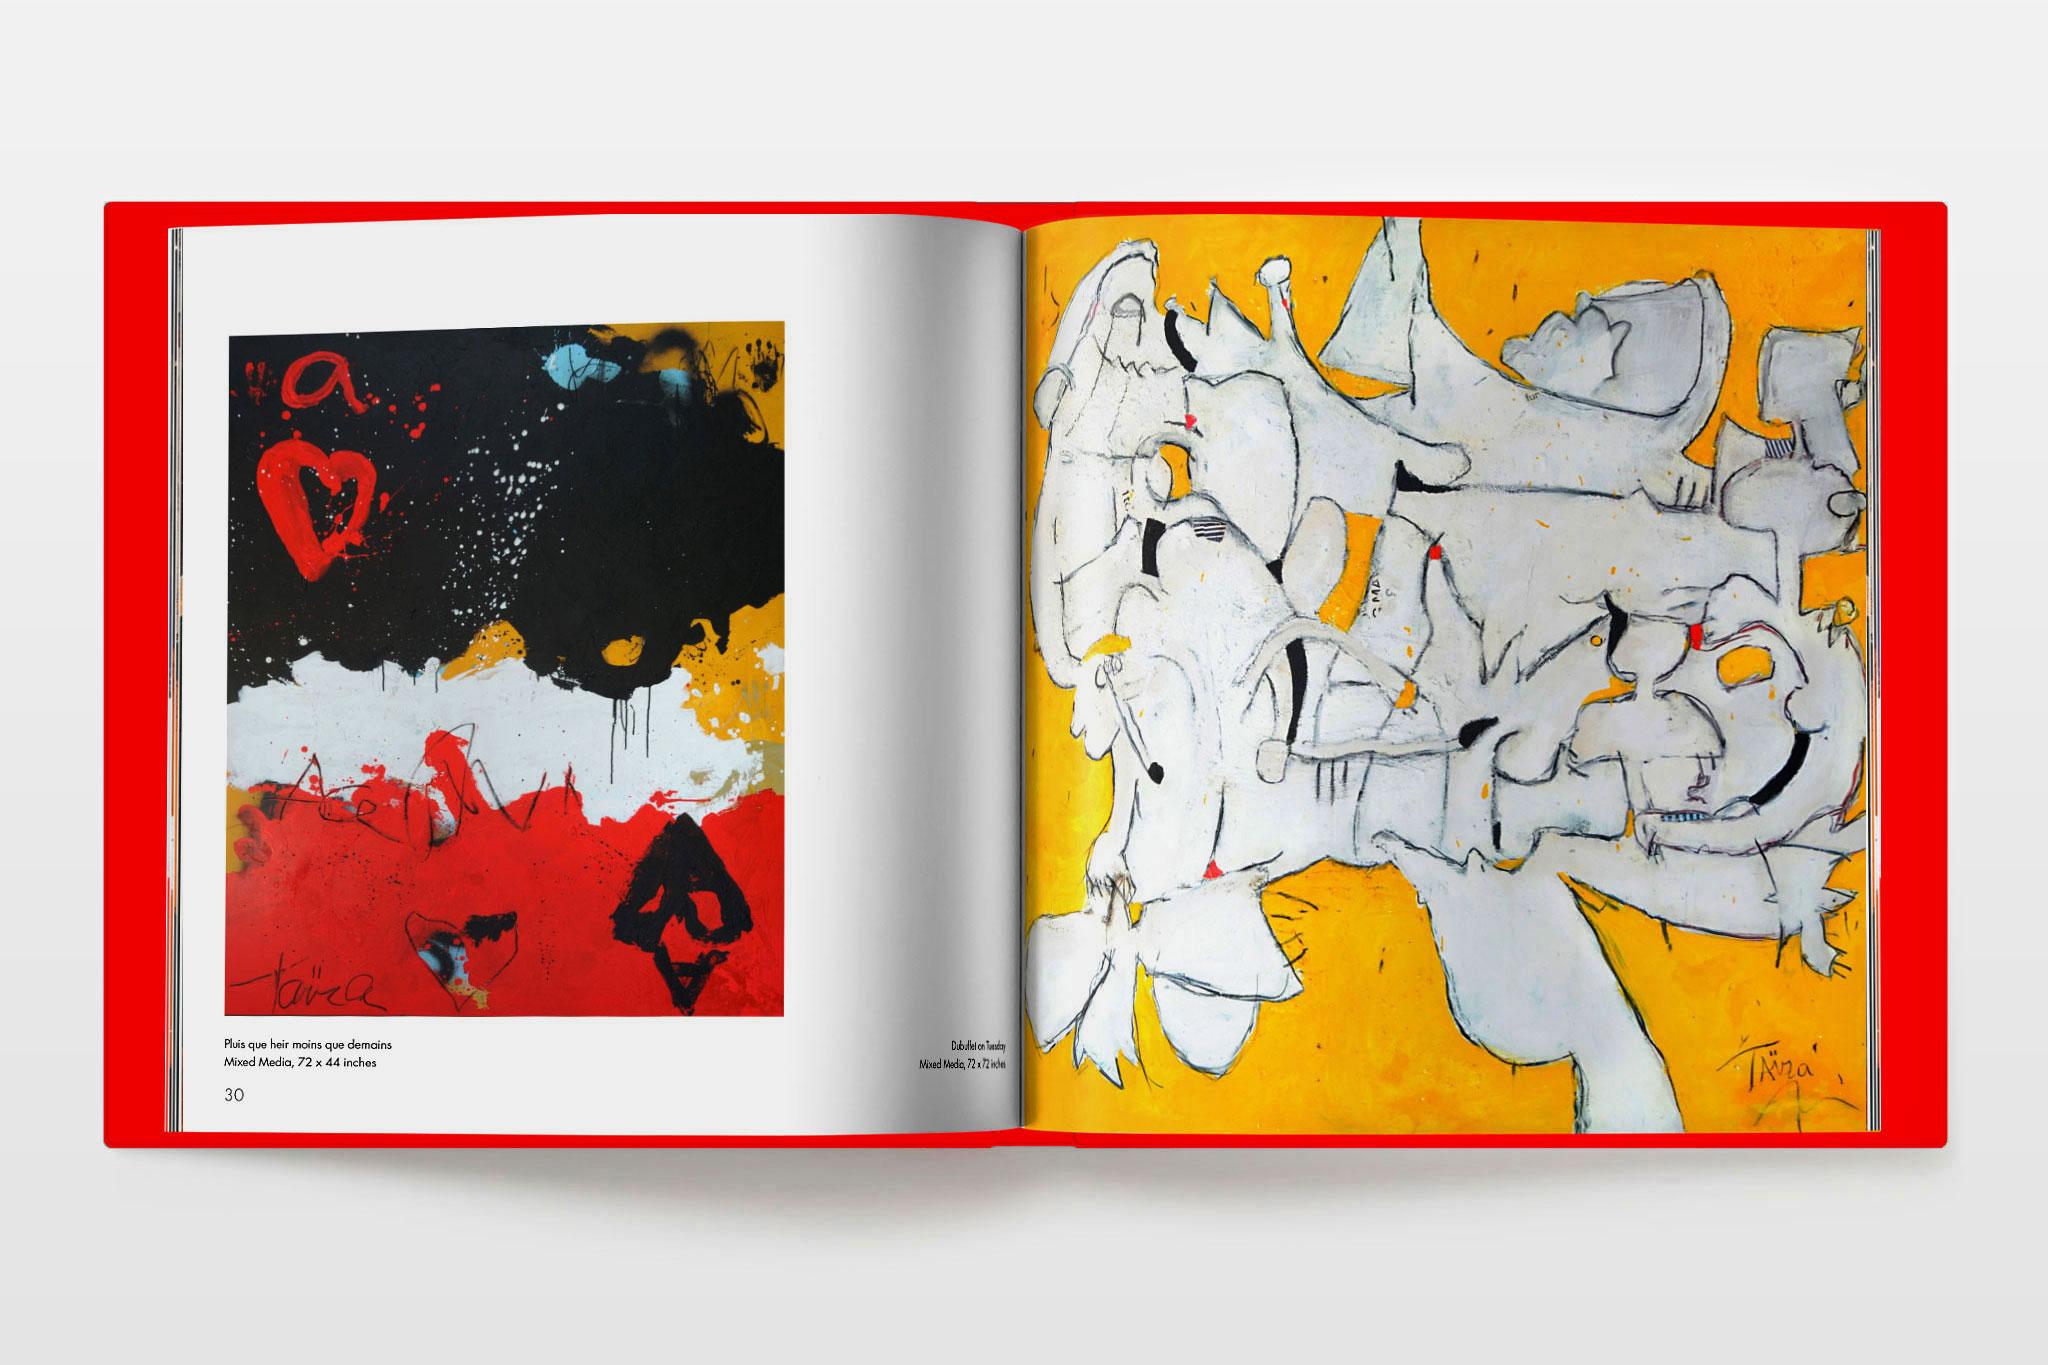 Taira book design